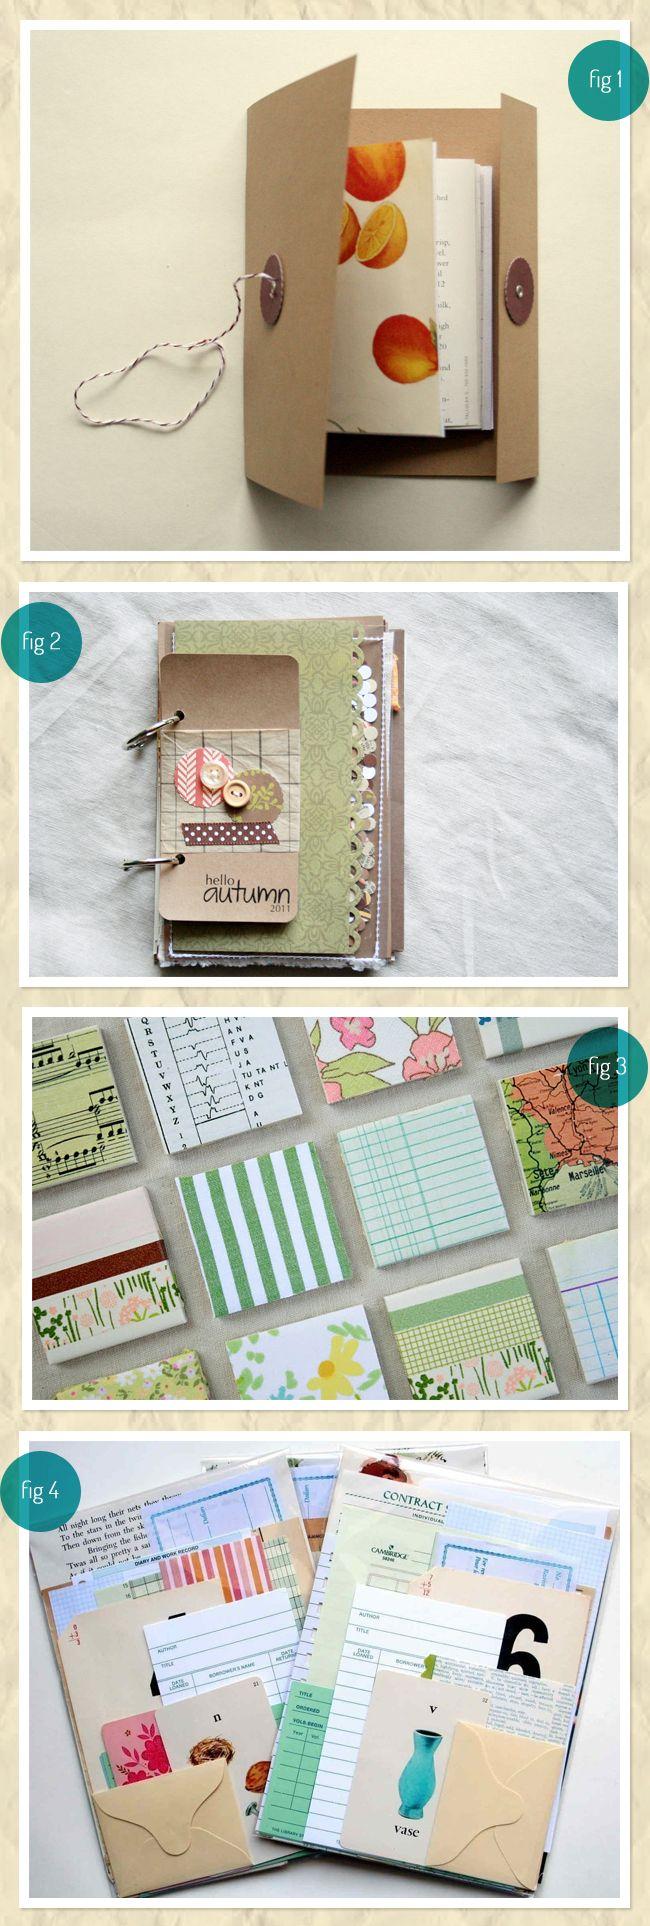 Different paper crafts.: Minis Books, Crafts Ideas, Creative Ideas, Minis Album, Art Journals, Scrap Books, Journals Ideas, Scrapbook, Paper Crafts